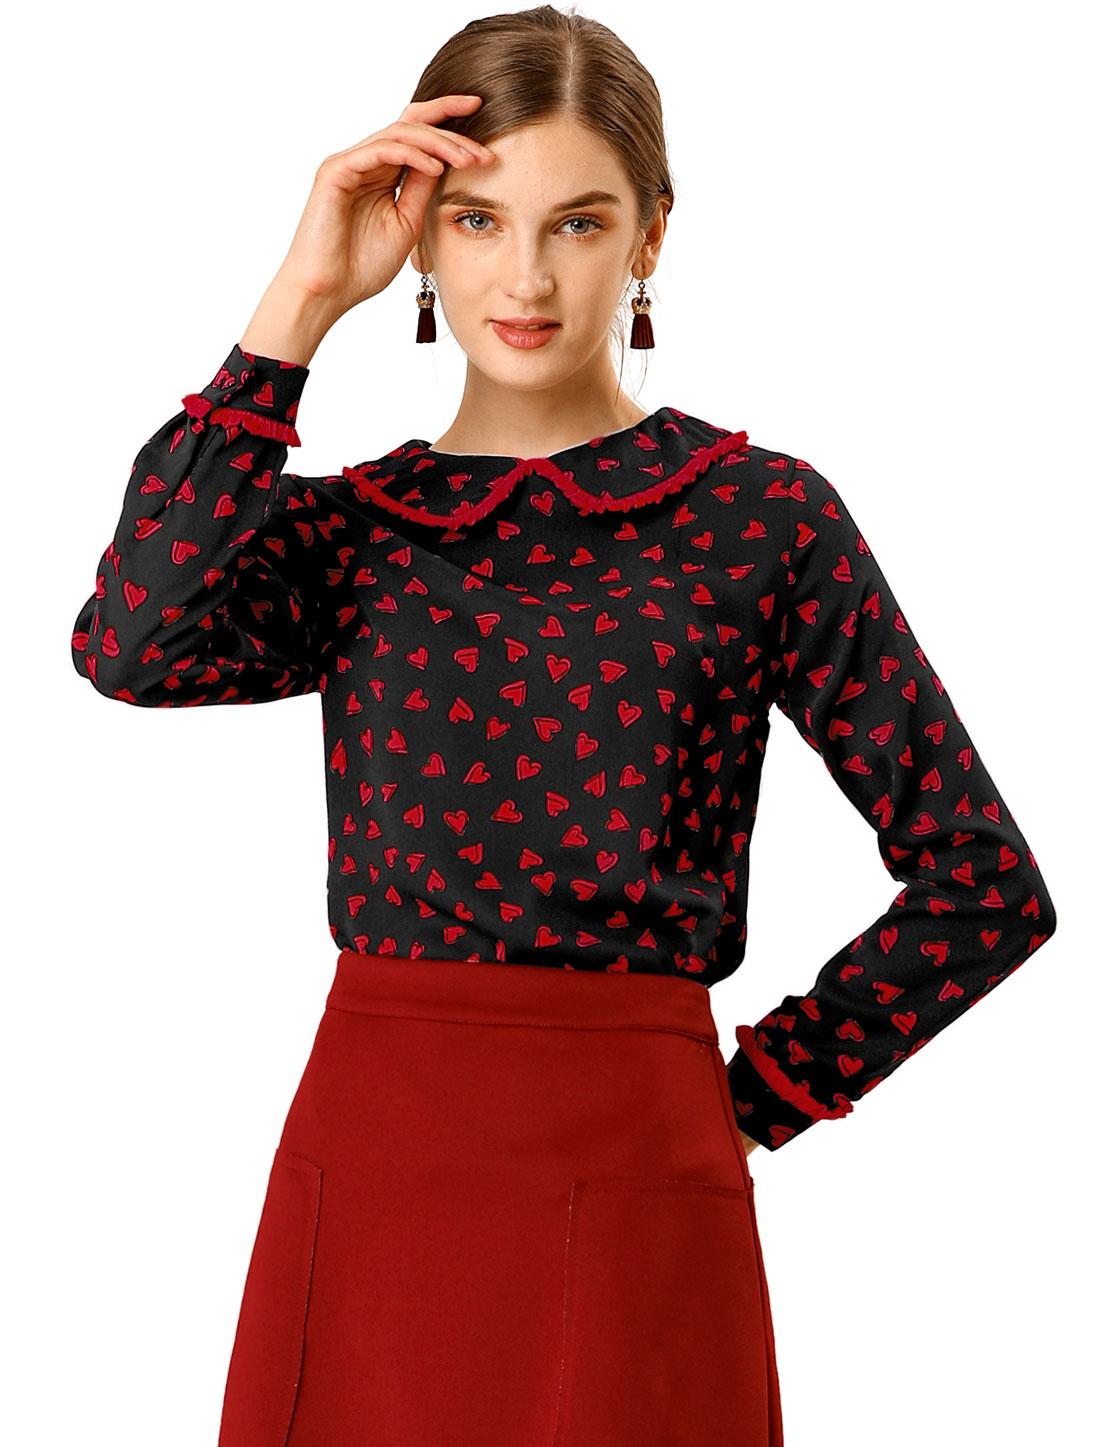 Allegra K Women's Cute Ruffle Peter Pan Collar Blouse Black L